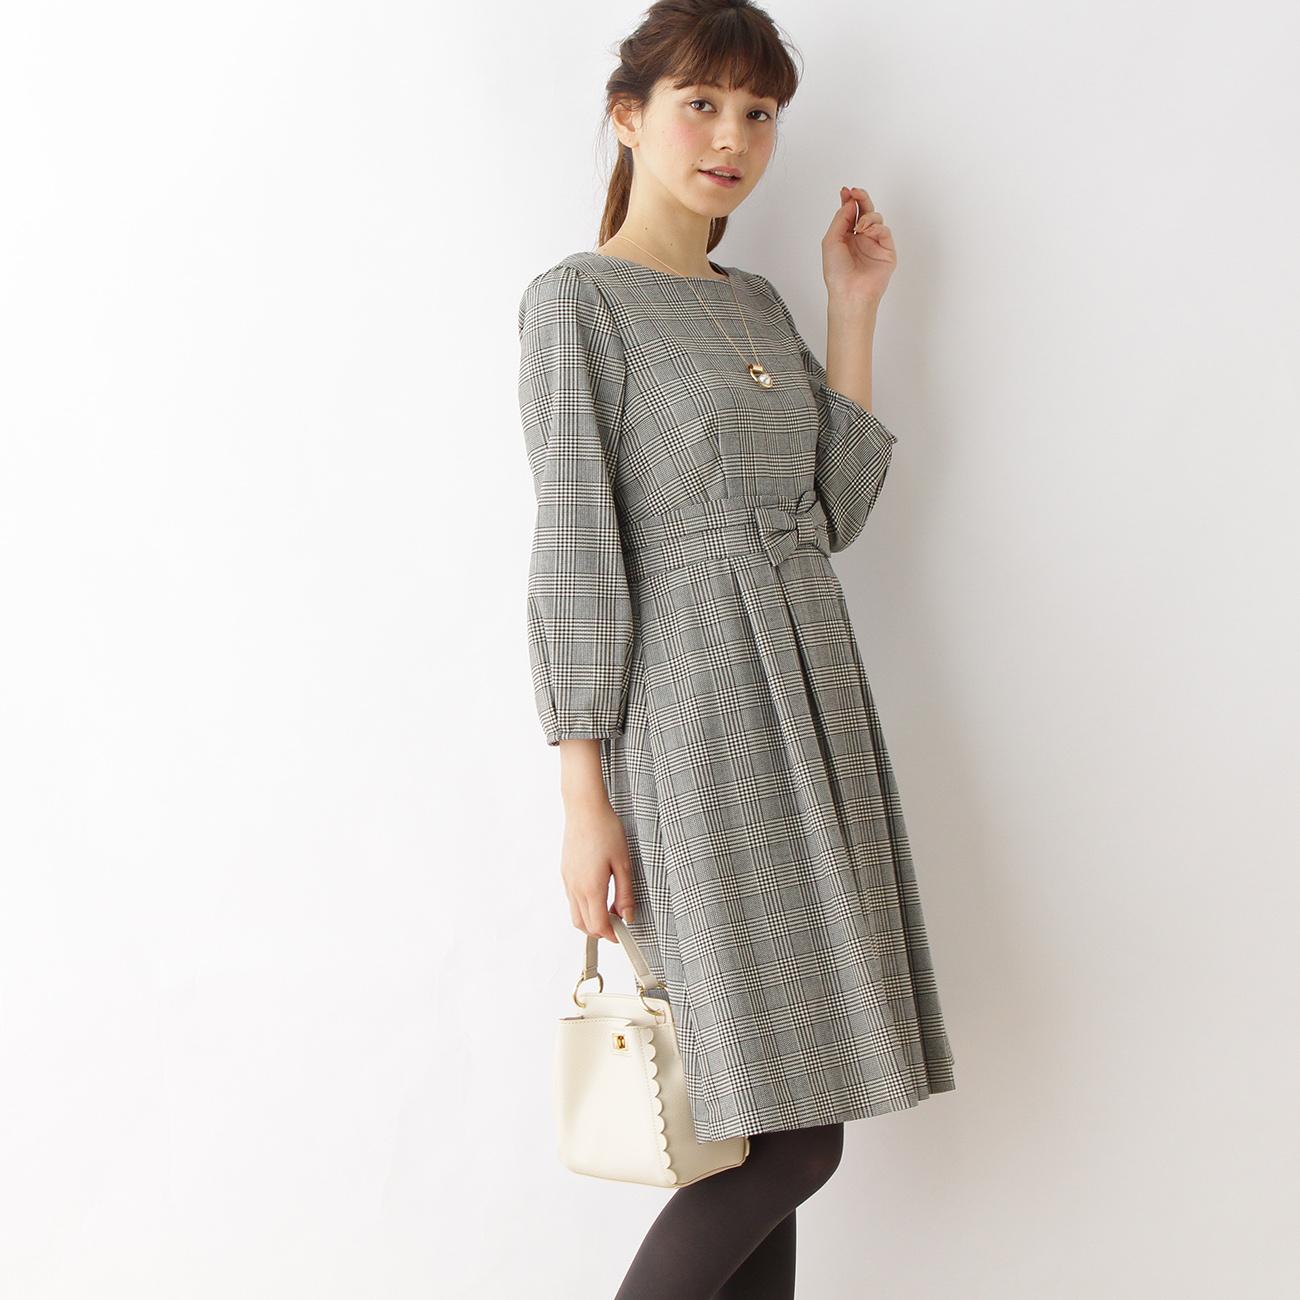 【Couture brooch (クチュールブローチ)】【WEB限定プライス】【WEB限定サイズ(S・LL)あり】ウエストリボンワンピースレディース ワンピース ワンピース グレー